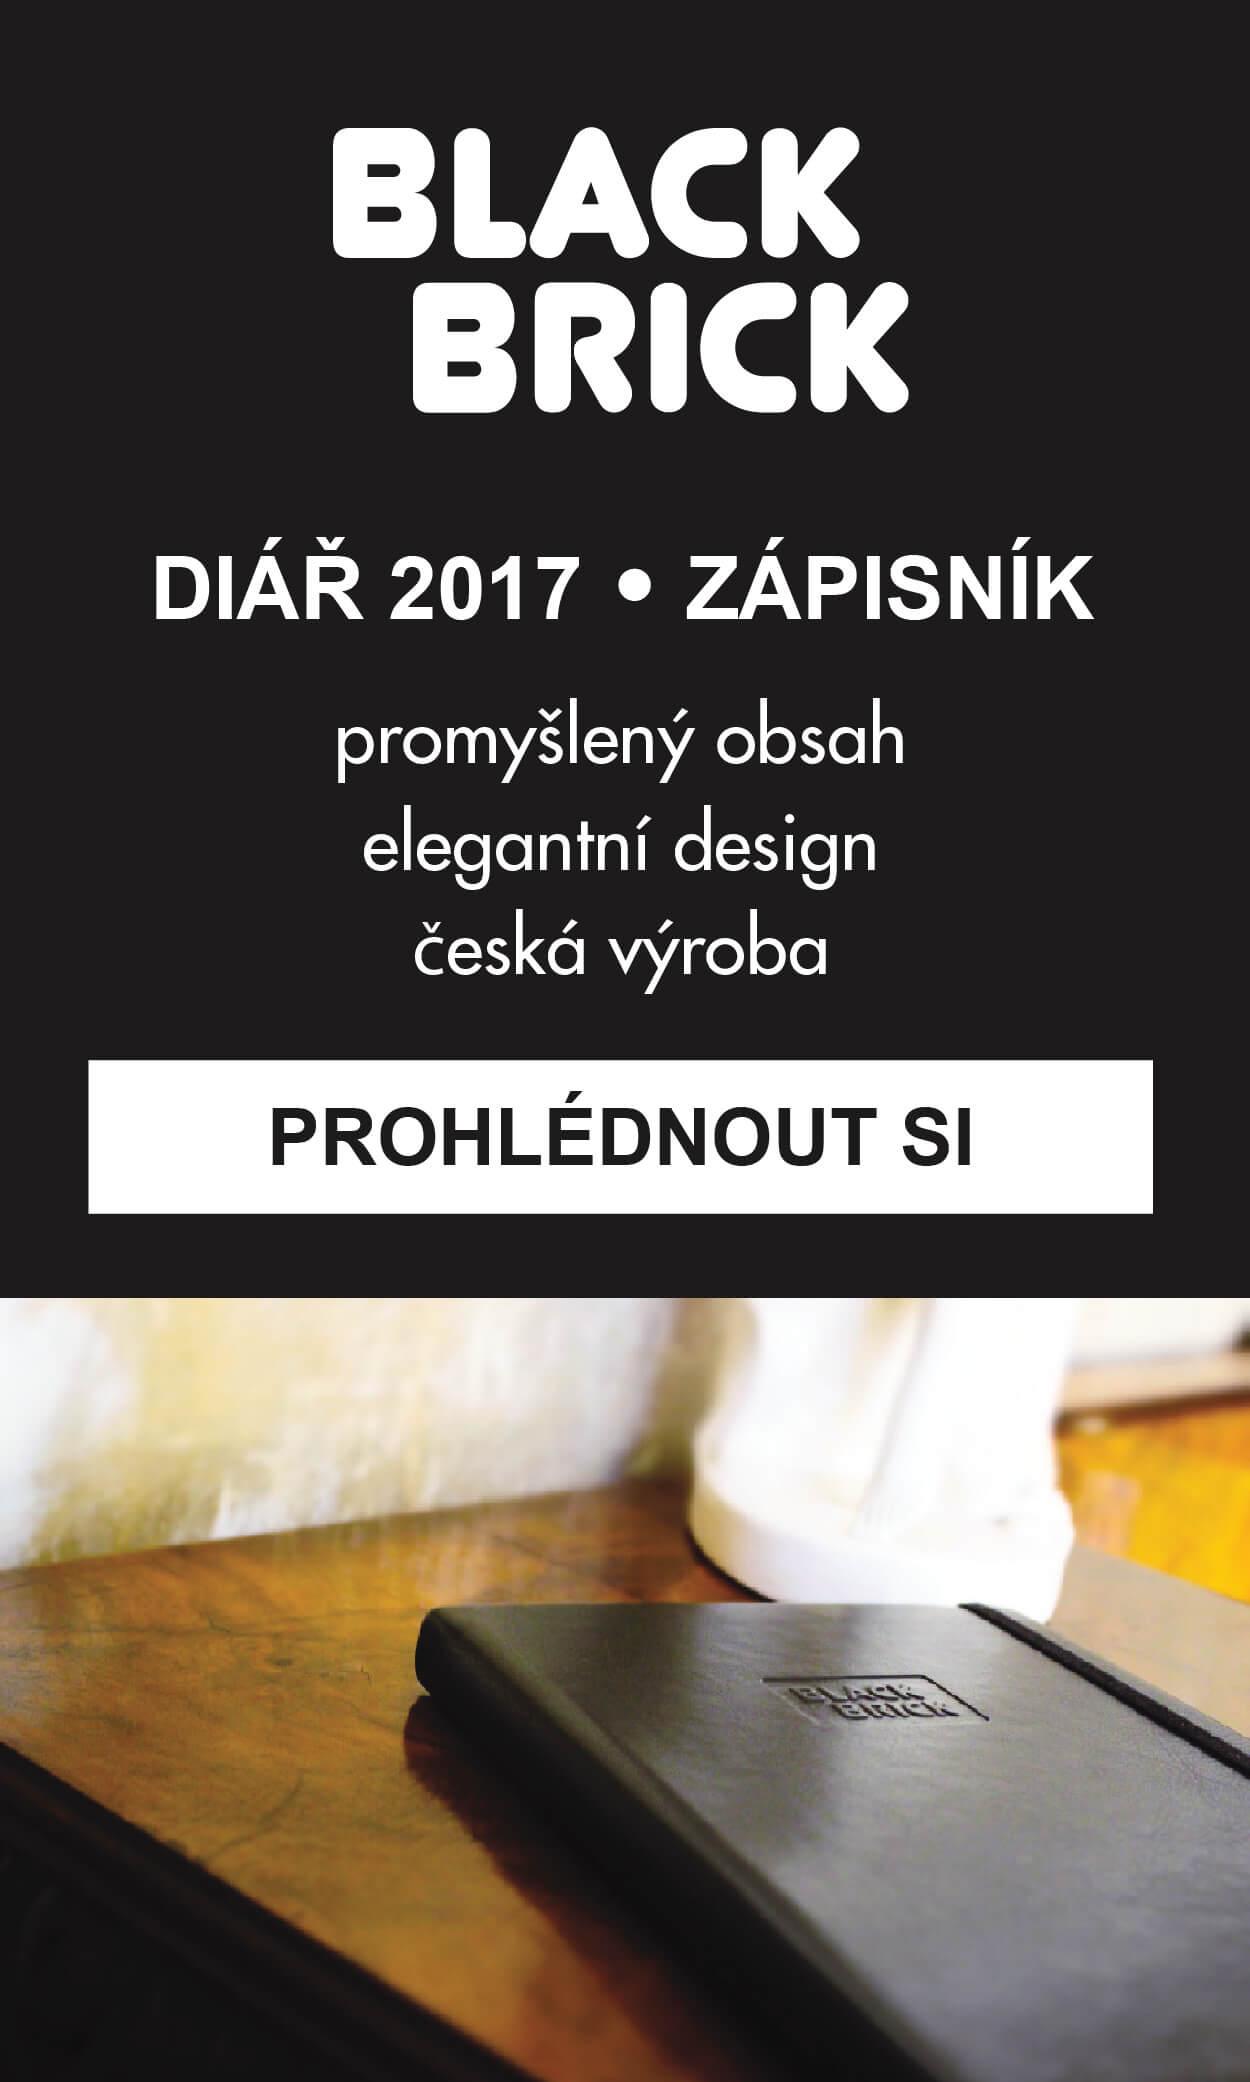 blackbrick.cz